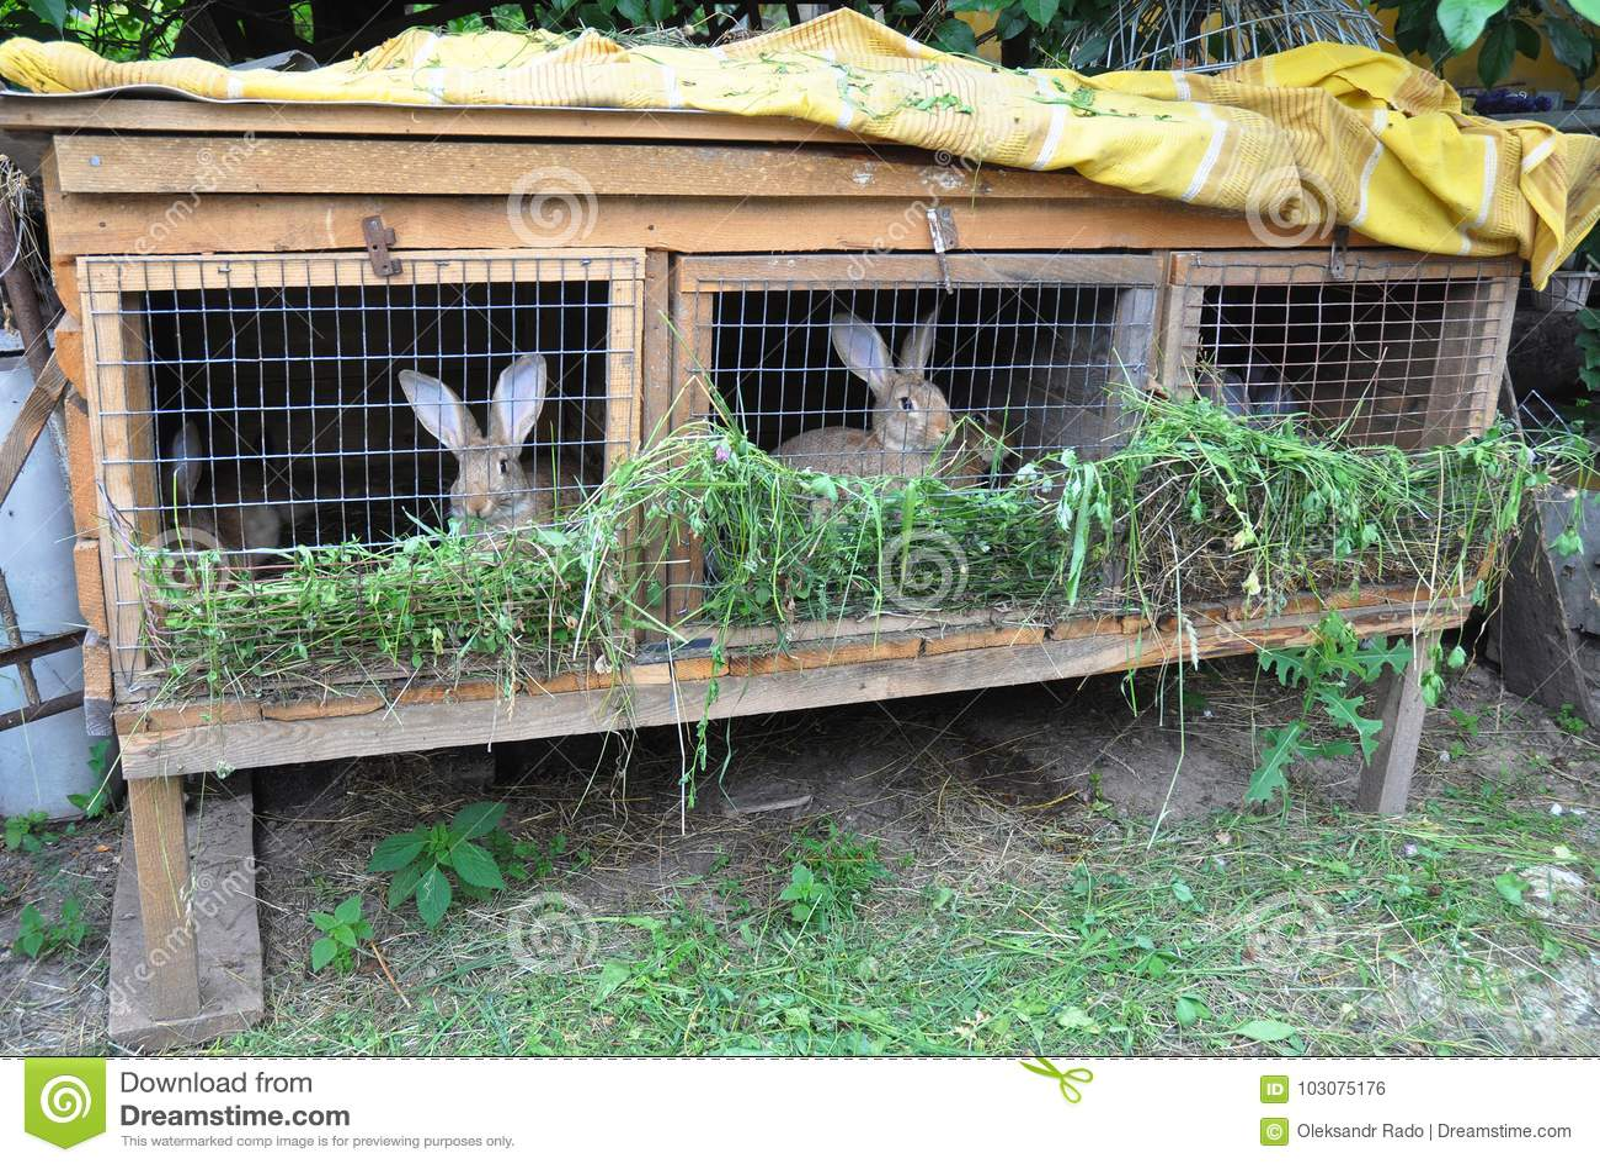 Small Rabbit Farming Feeding Rabbits Rabbit Cage Stock Photo Image Of Cuddly Furry 103075176